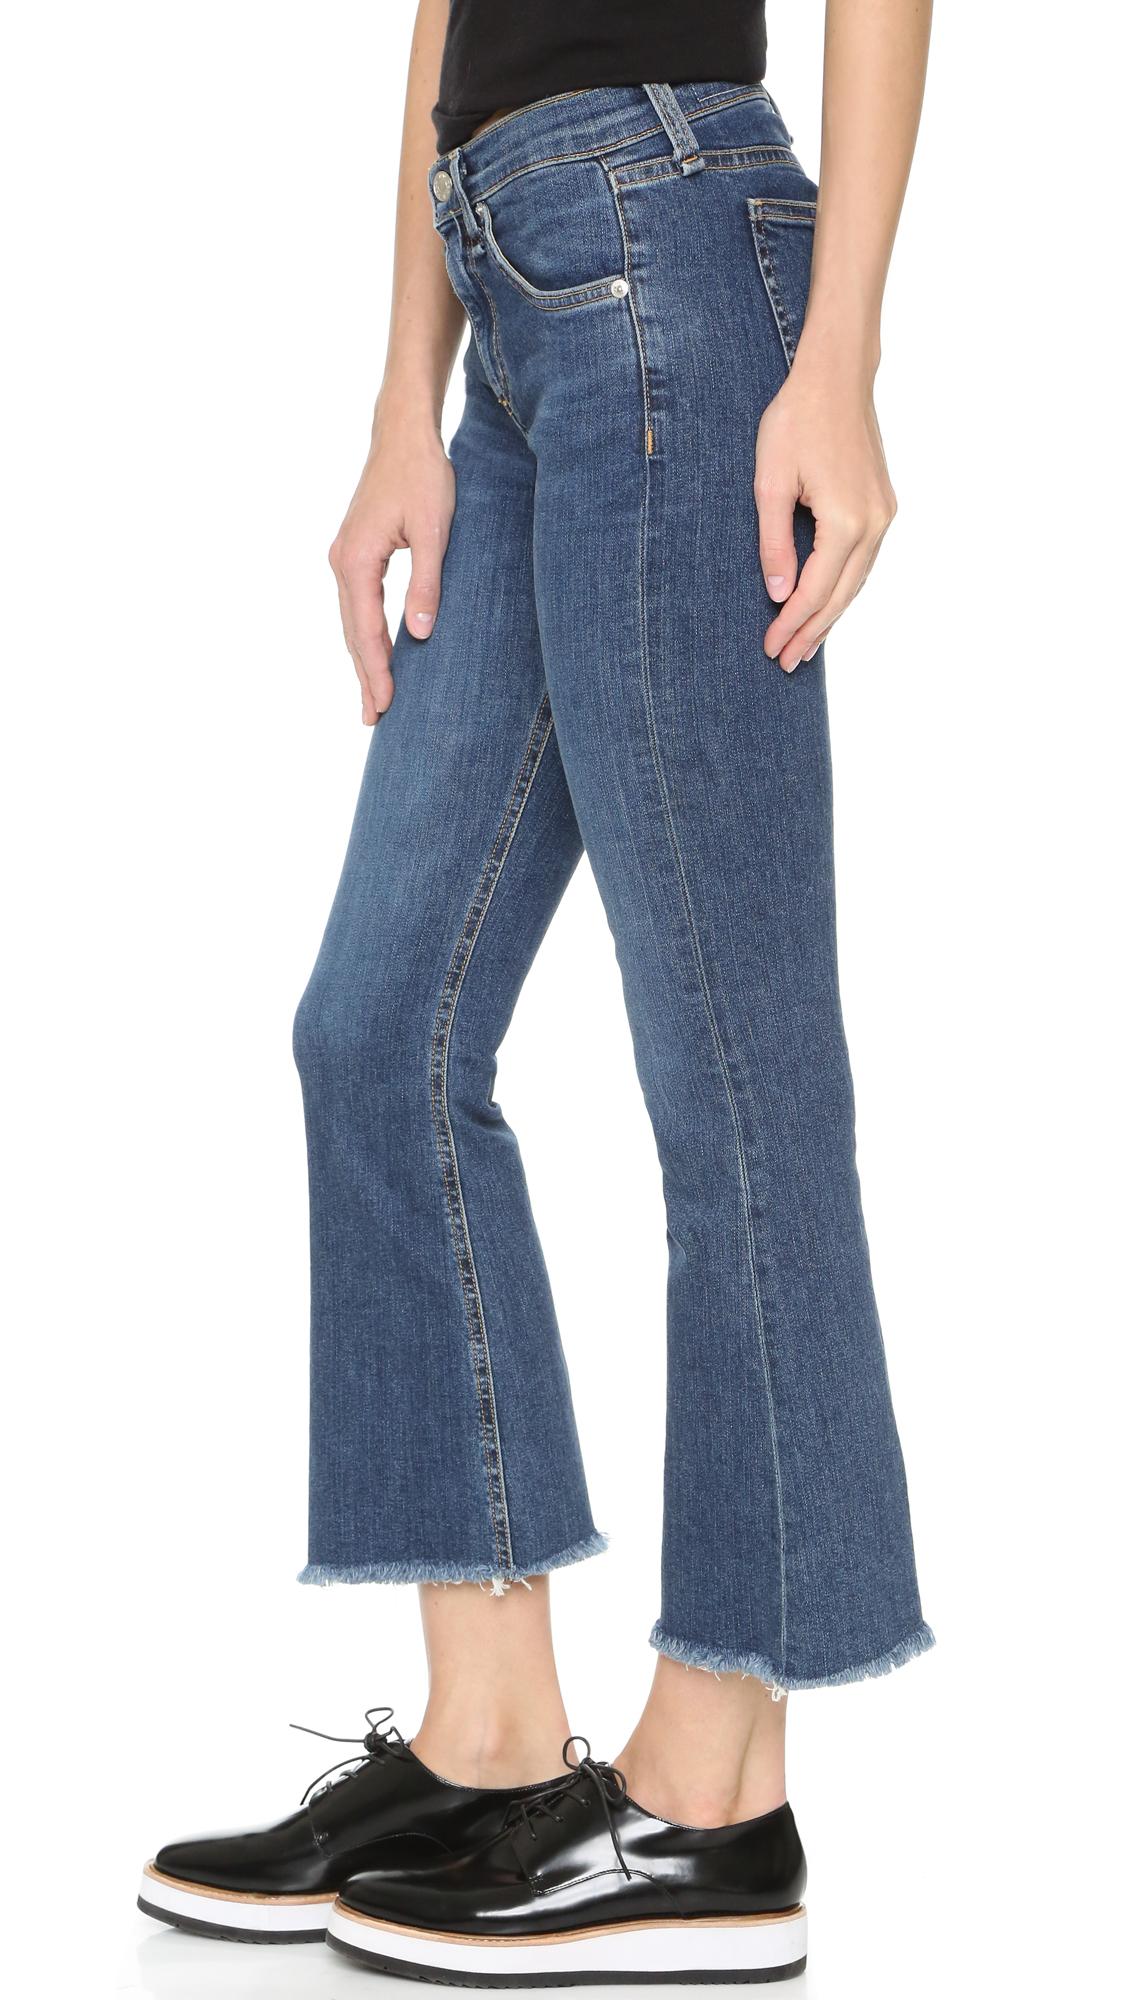 Rag   Bone JEAN Crop Flare Jeans   SHOPBOP 9e2dd662db